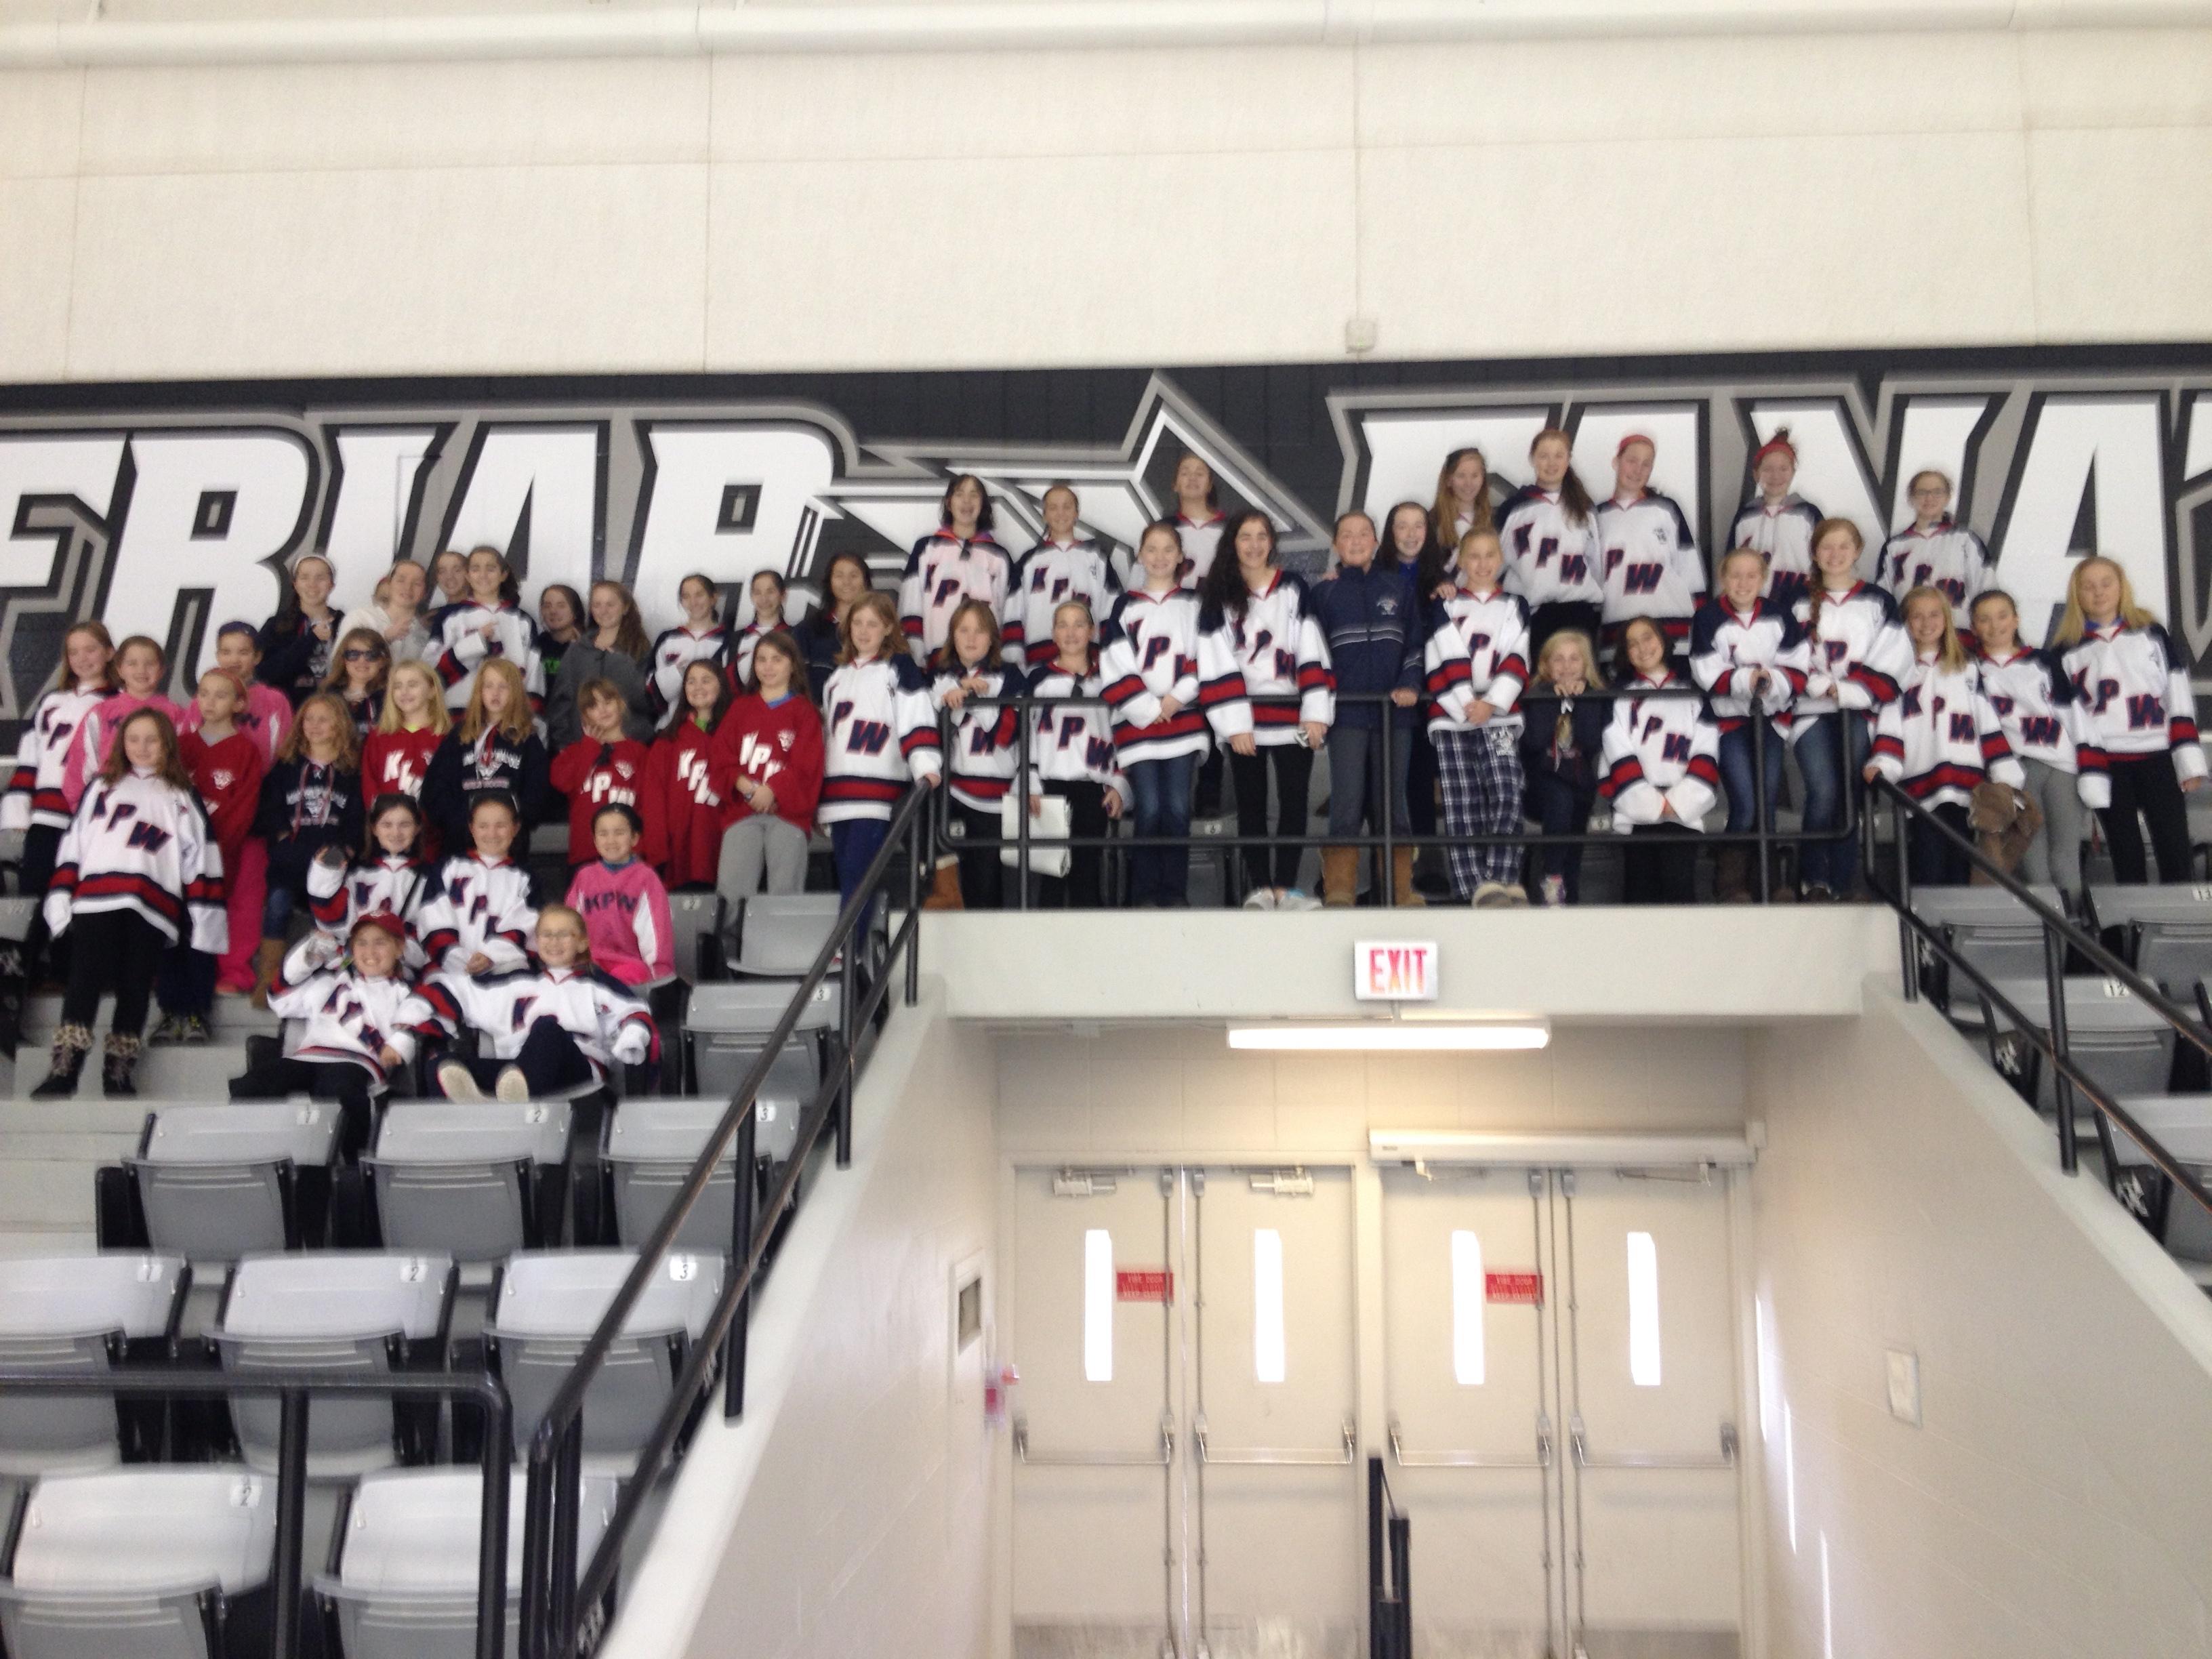 King Philip Walpole girls hockey players enjoying a women's hockey game at Providence College.